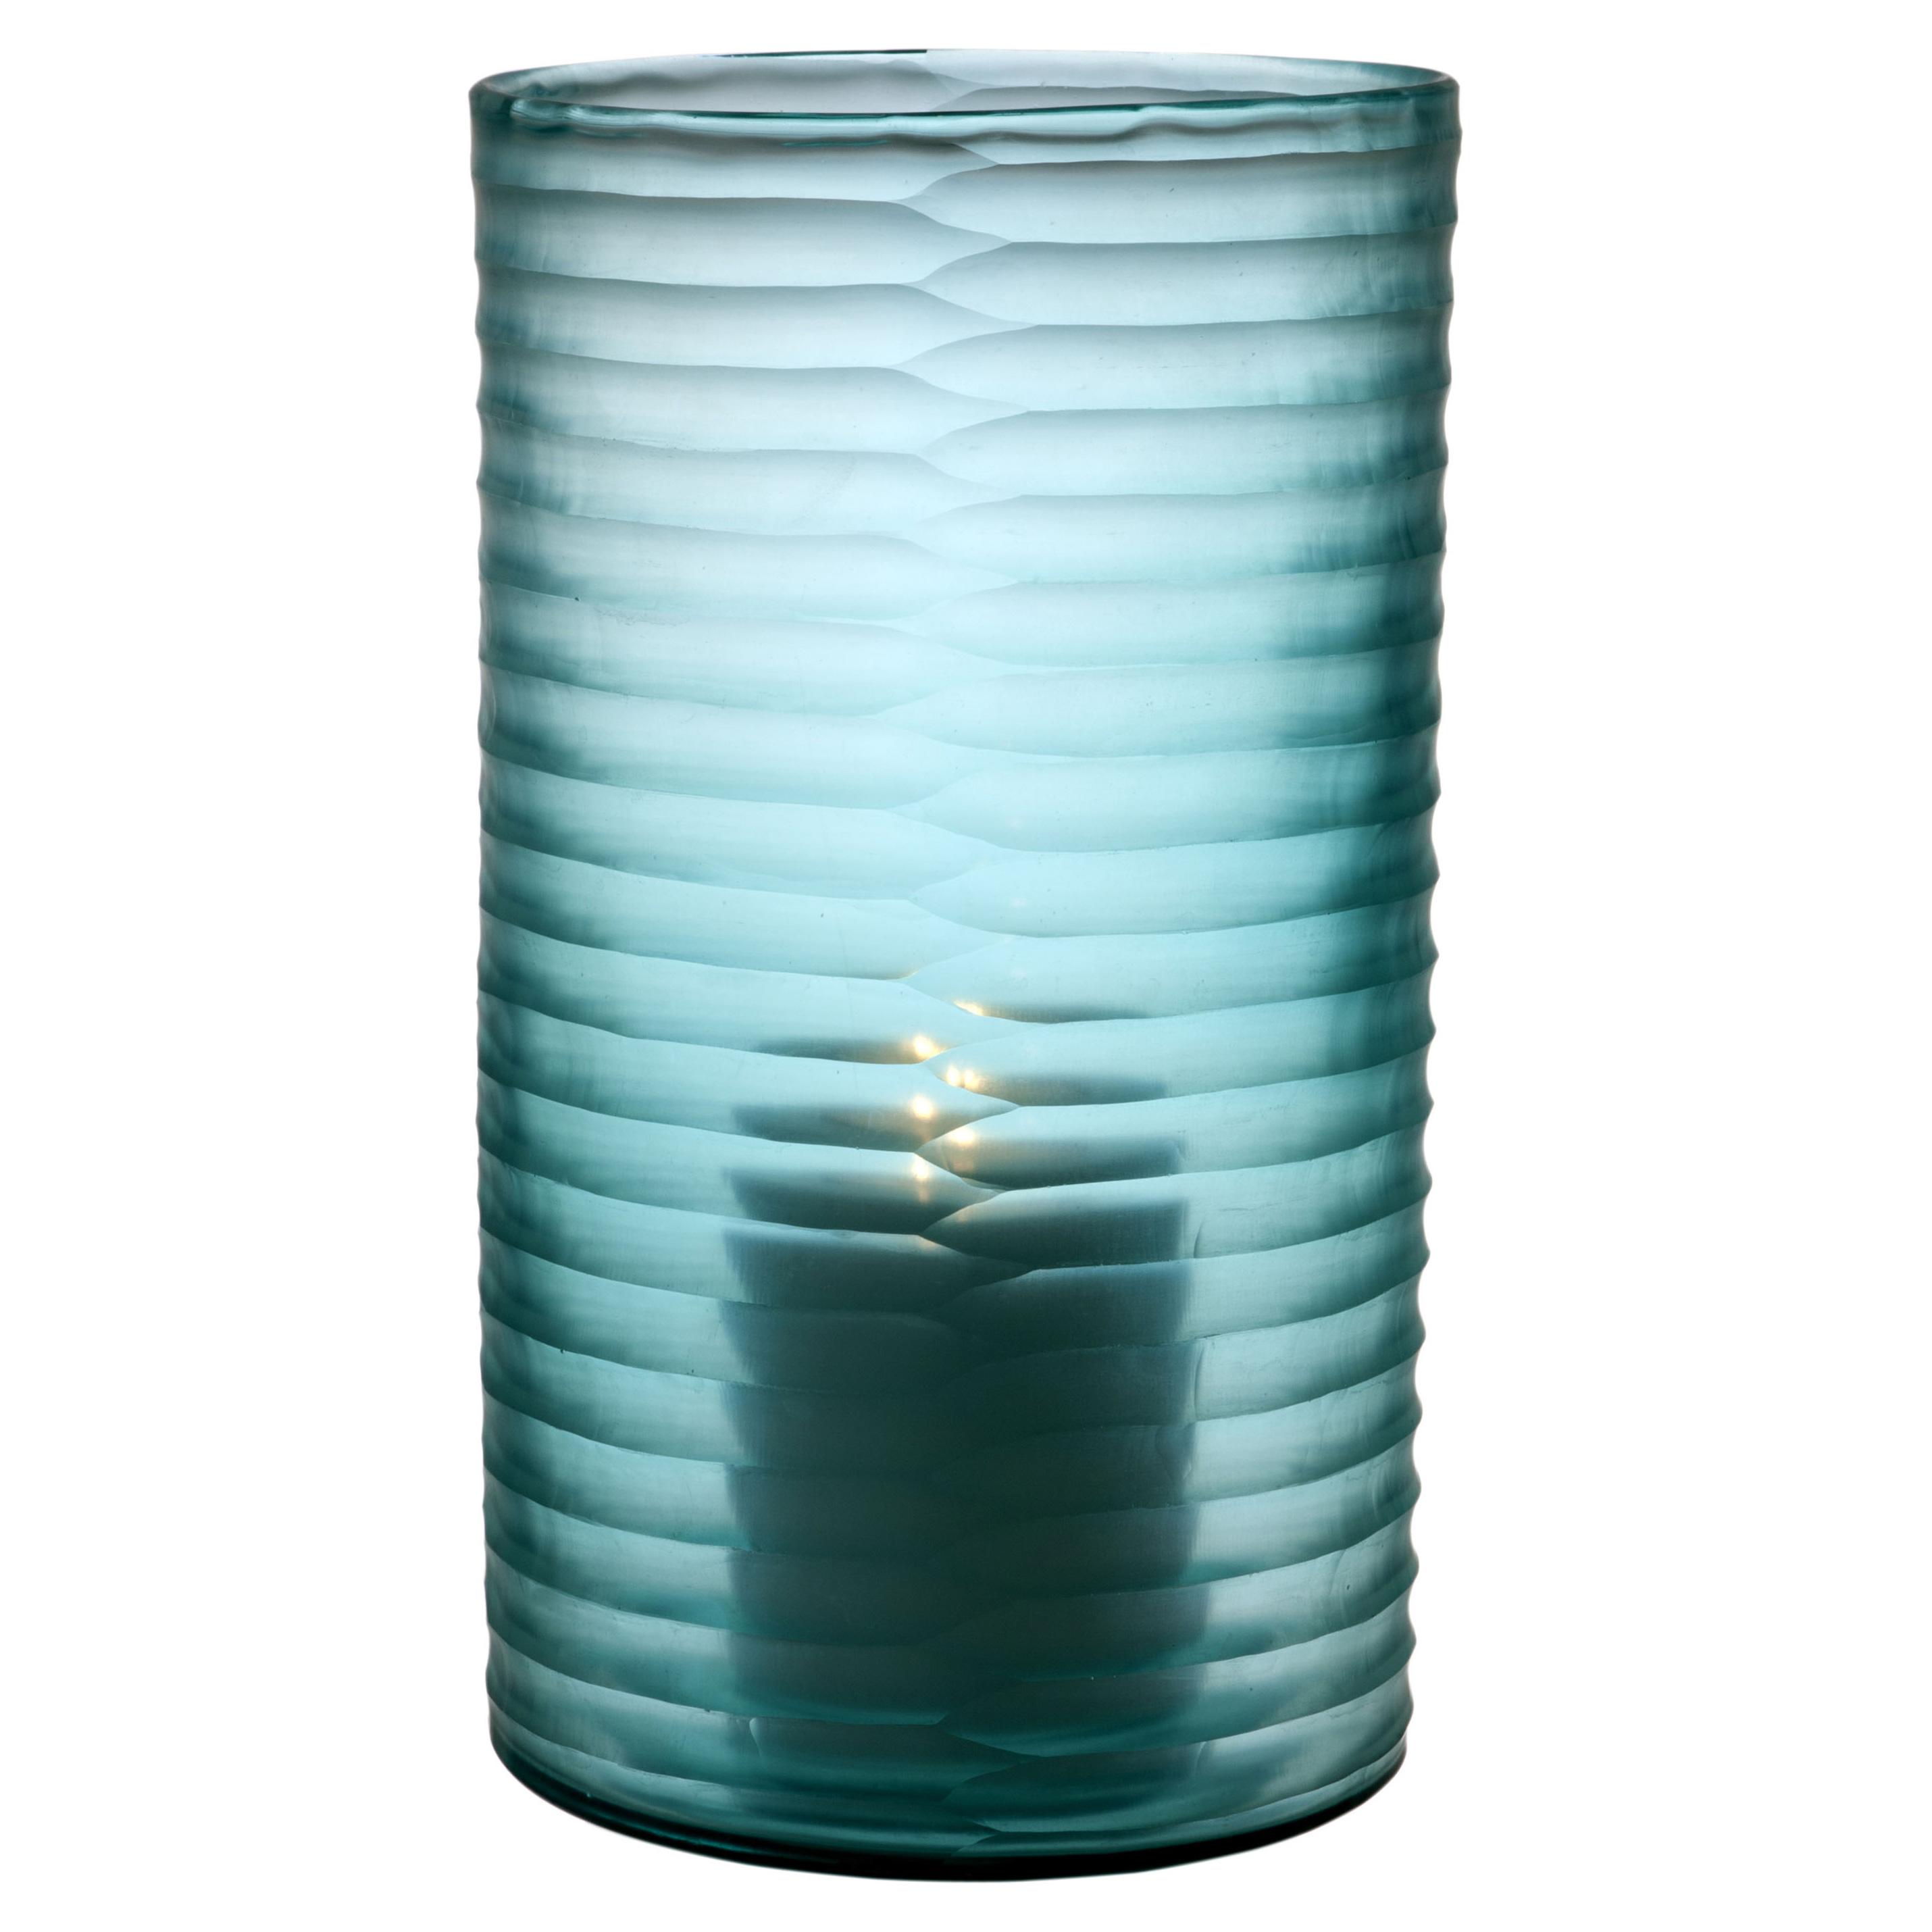 Karl Coastal Beach Light Blue Hurricane Candleholder - 14H